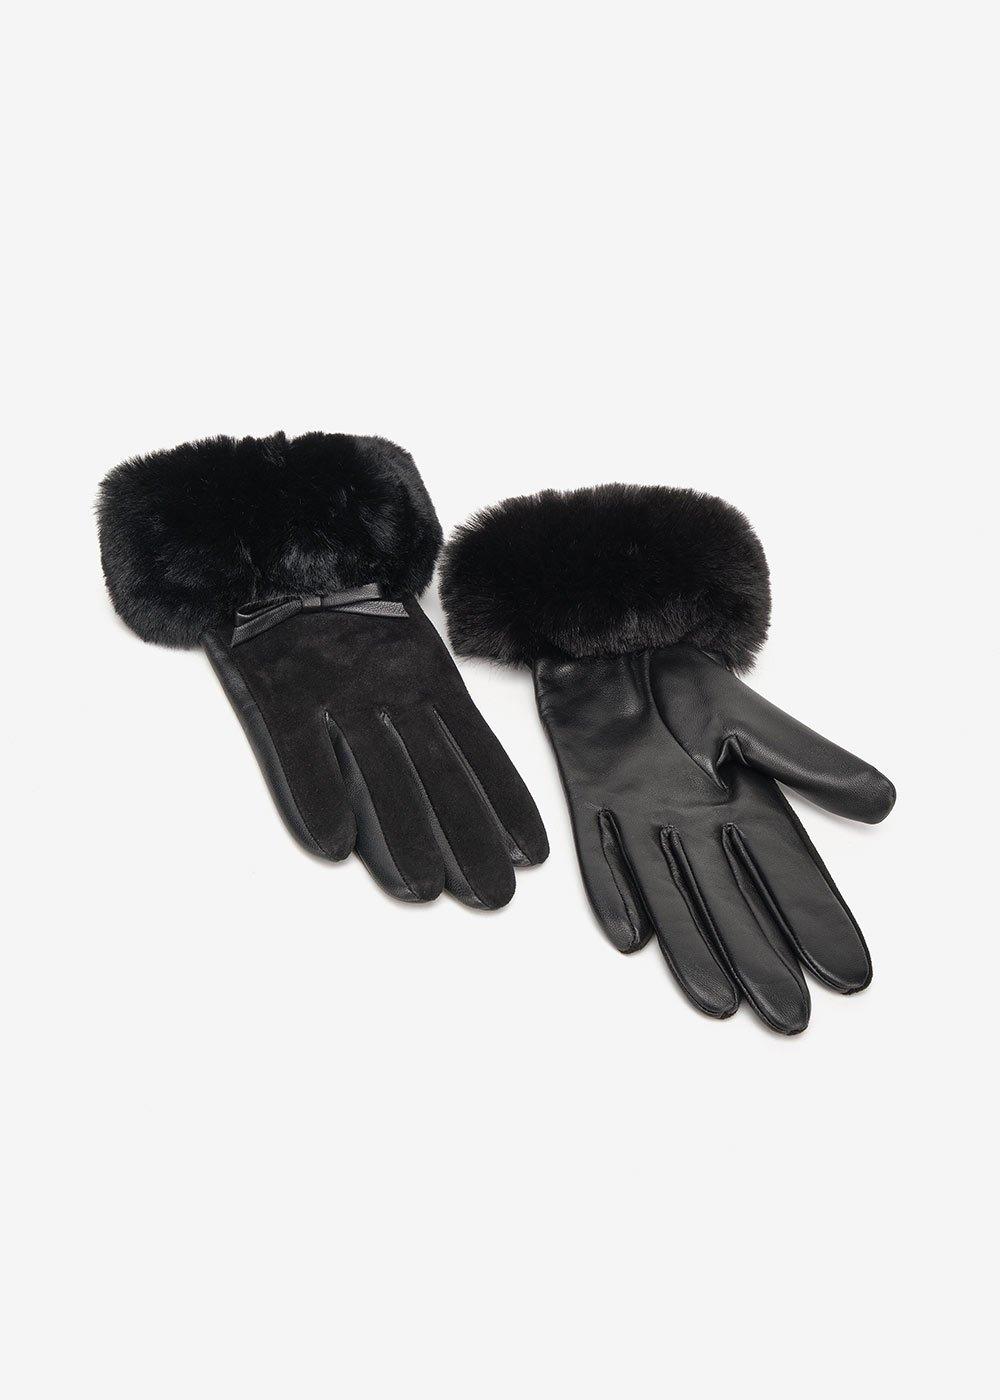 Gradis genuine leather gloves - Black - Woman